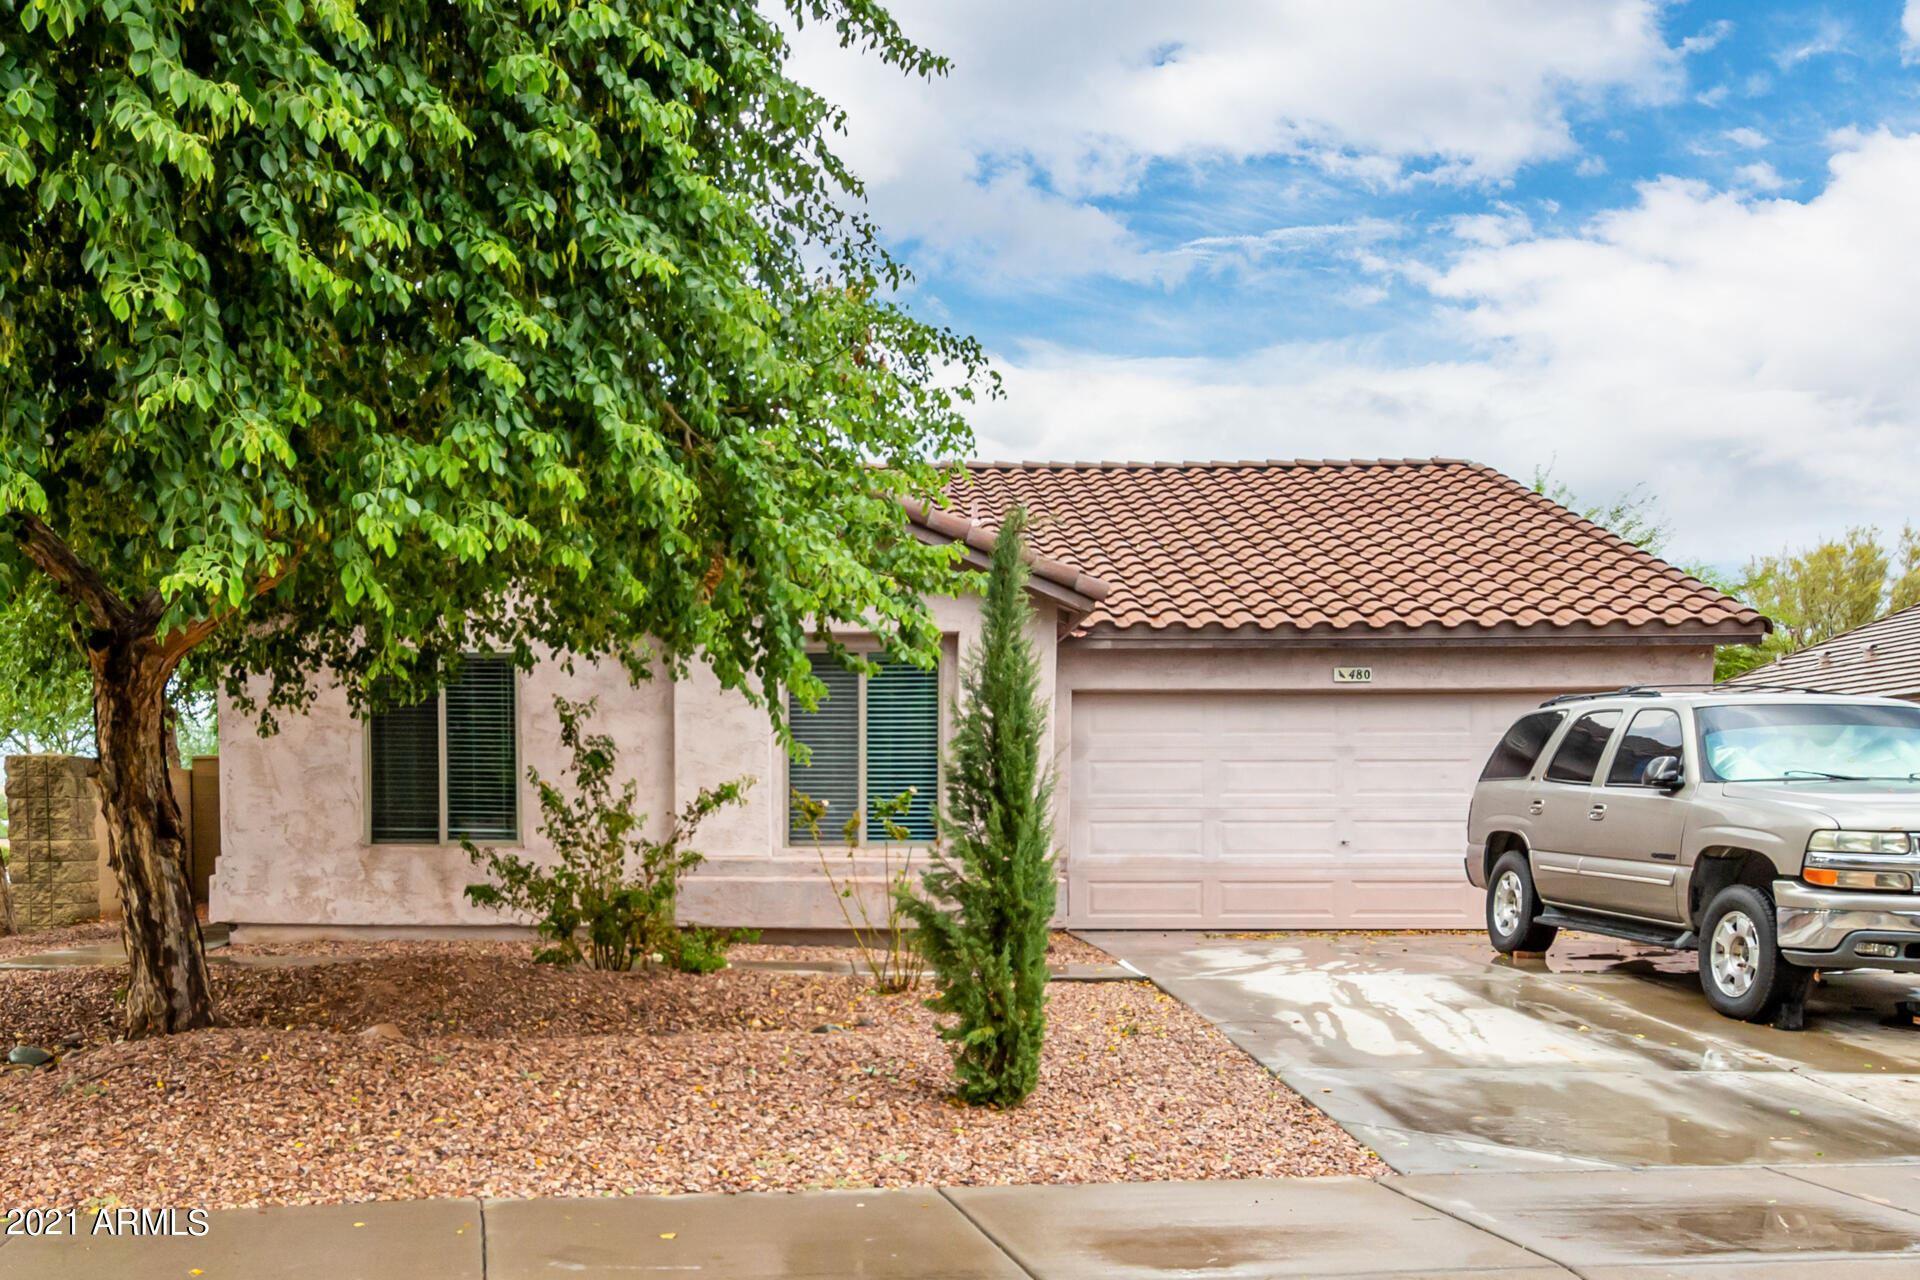 480 E KENT Avenue, Chandler, AZ 85225 - MLS#: 6297774